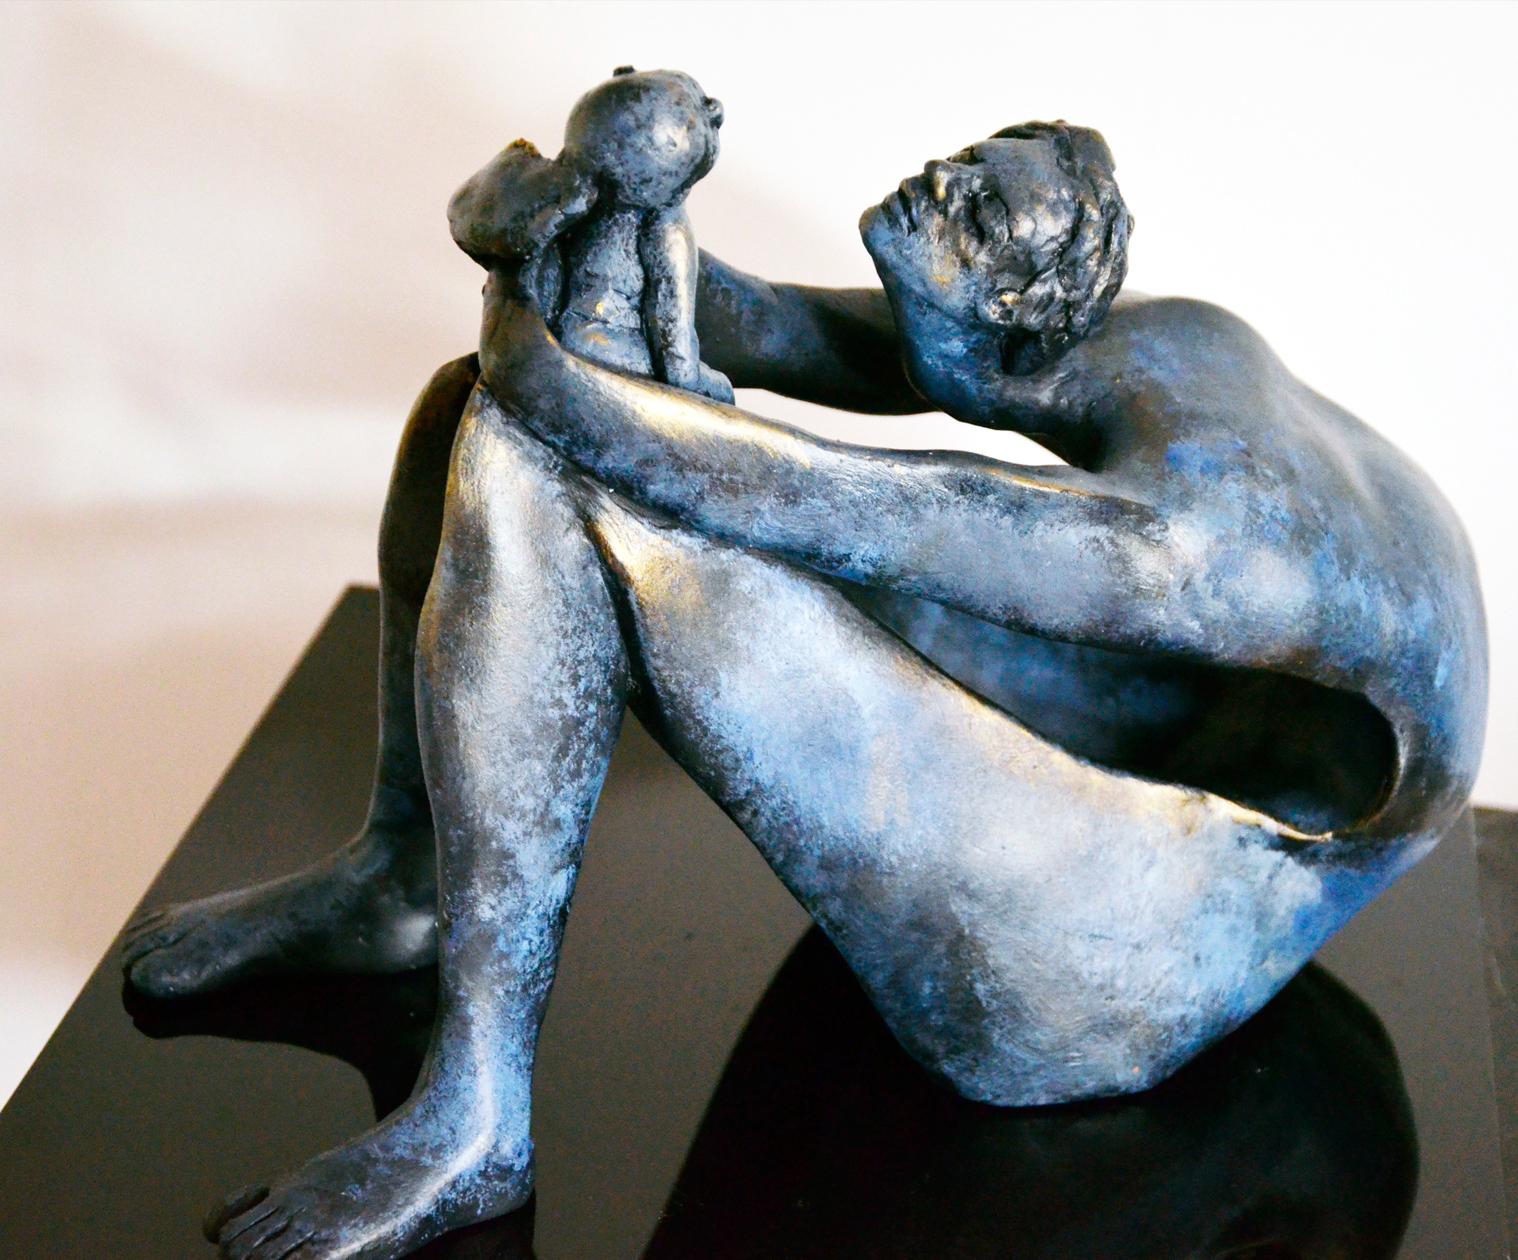 Maternity 28.15.25 cm Patinated terracotta